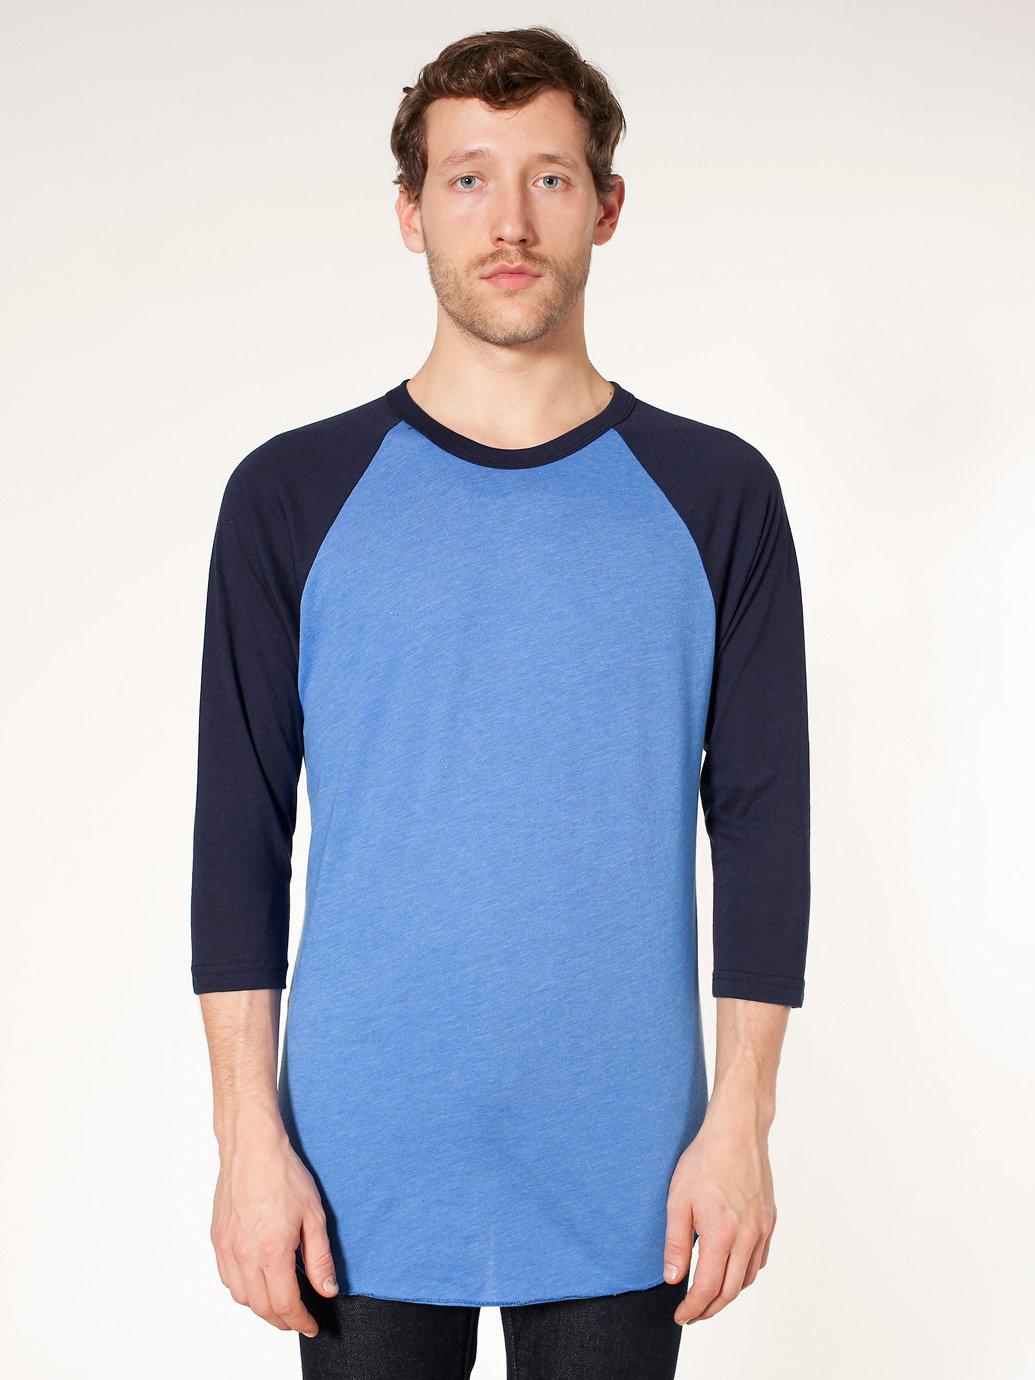 Poly-Cotton 3/4 Sleeve Raglan Shirt | American Apparel